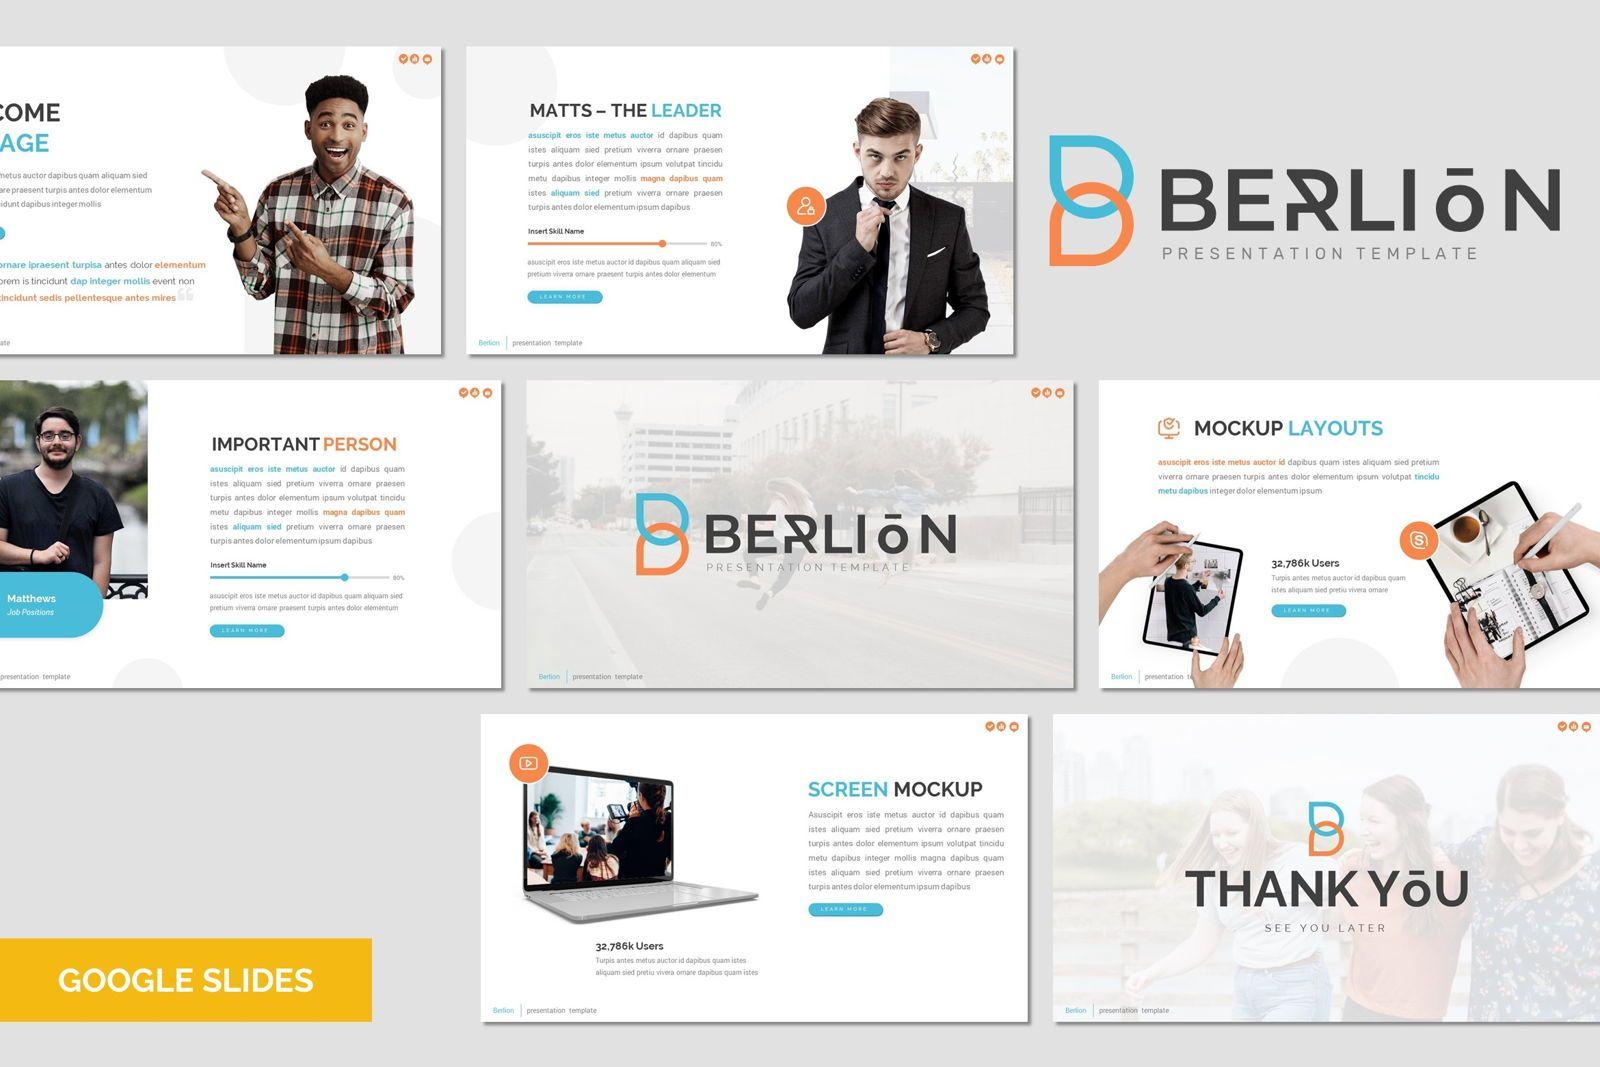 Berlion - Google Slides Template, 08041, Presentation Templates — PoweredTemplate.com